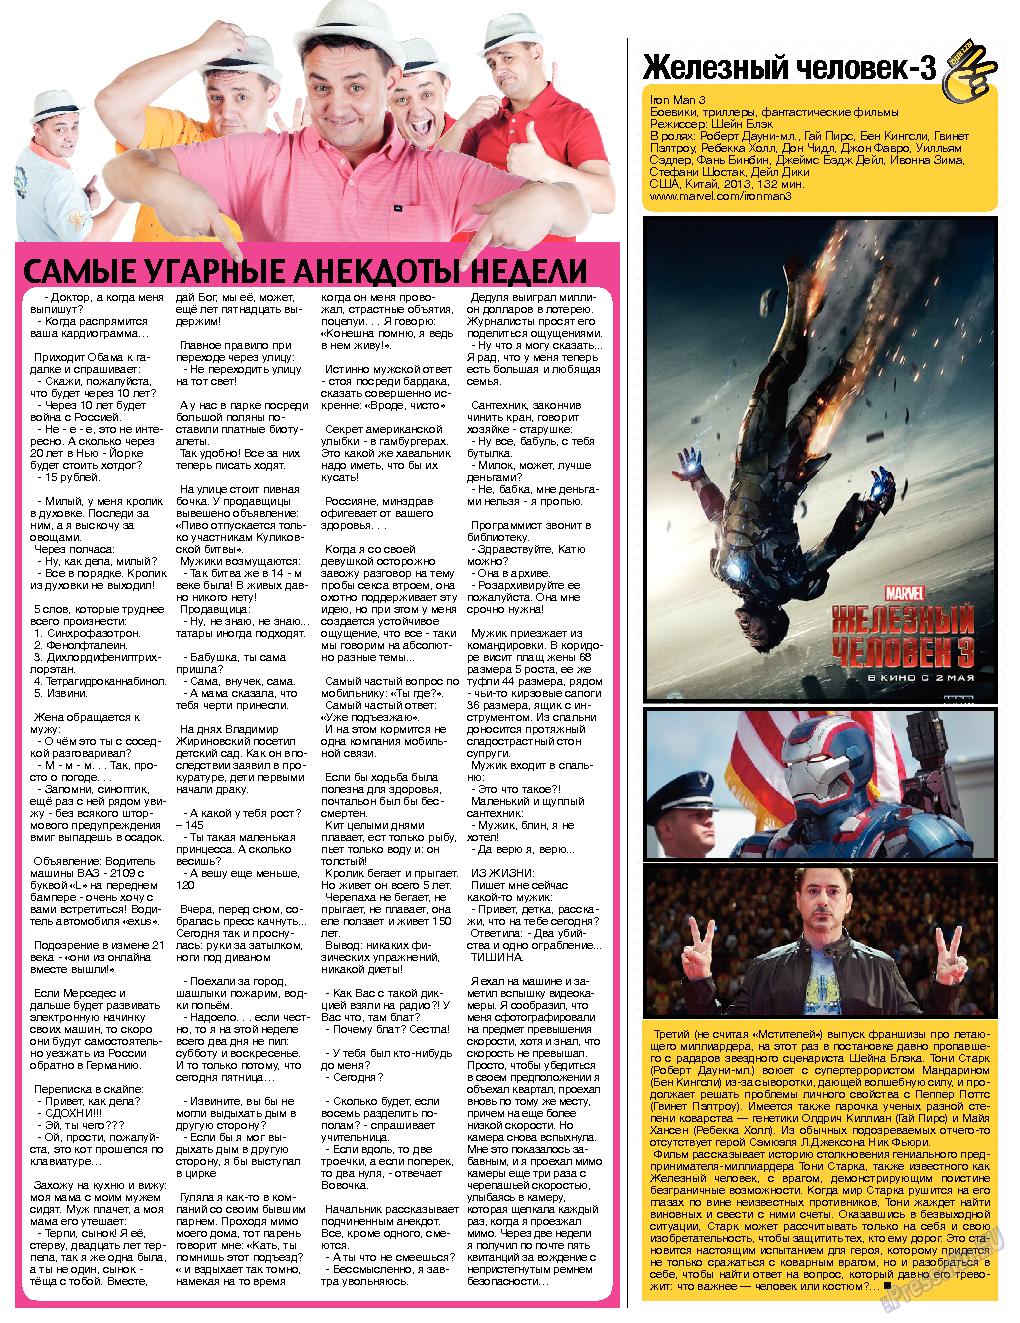 Дублин инфоцентр (газета). 2013 год, номер 18, стр. 7